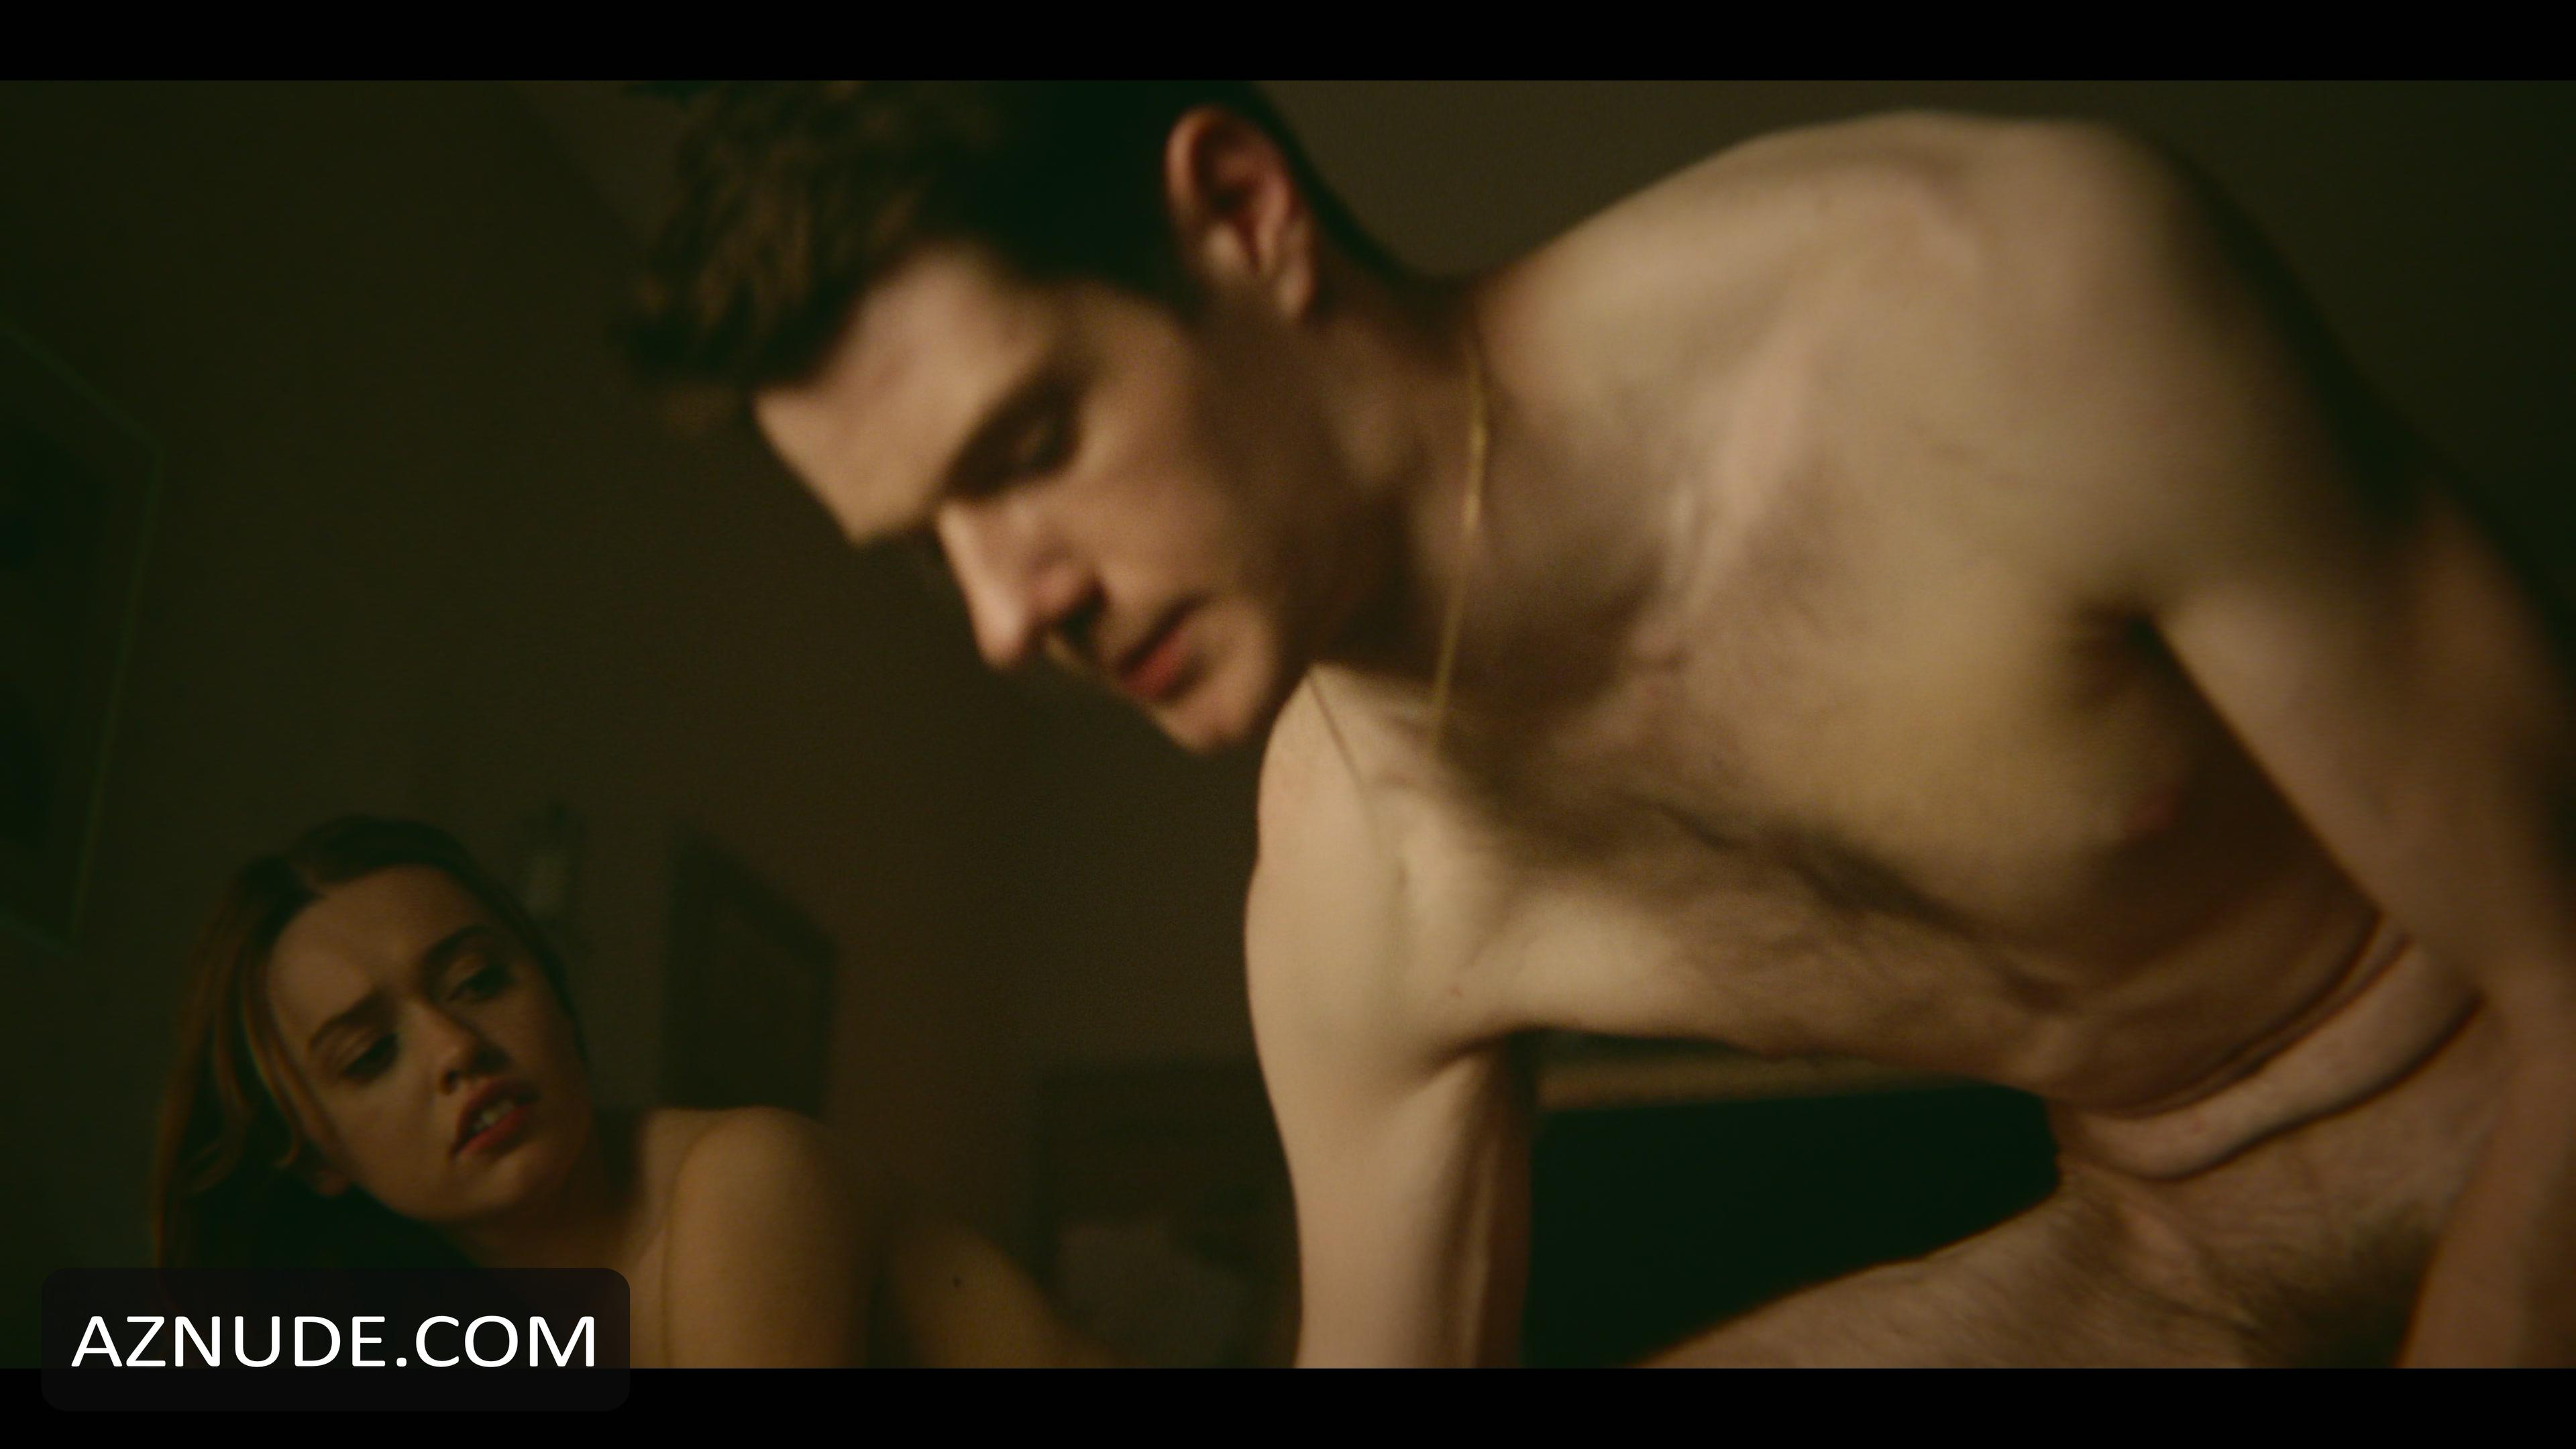 Connor swindells naked